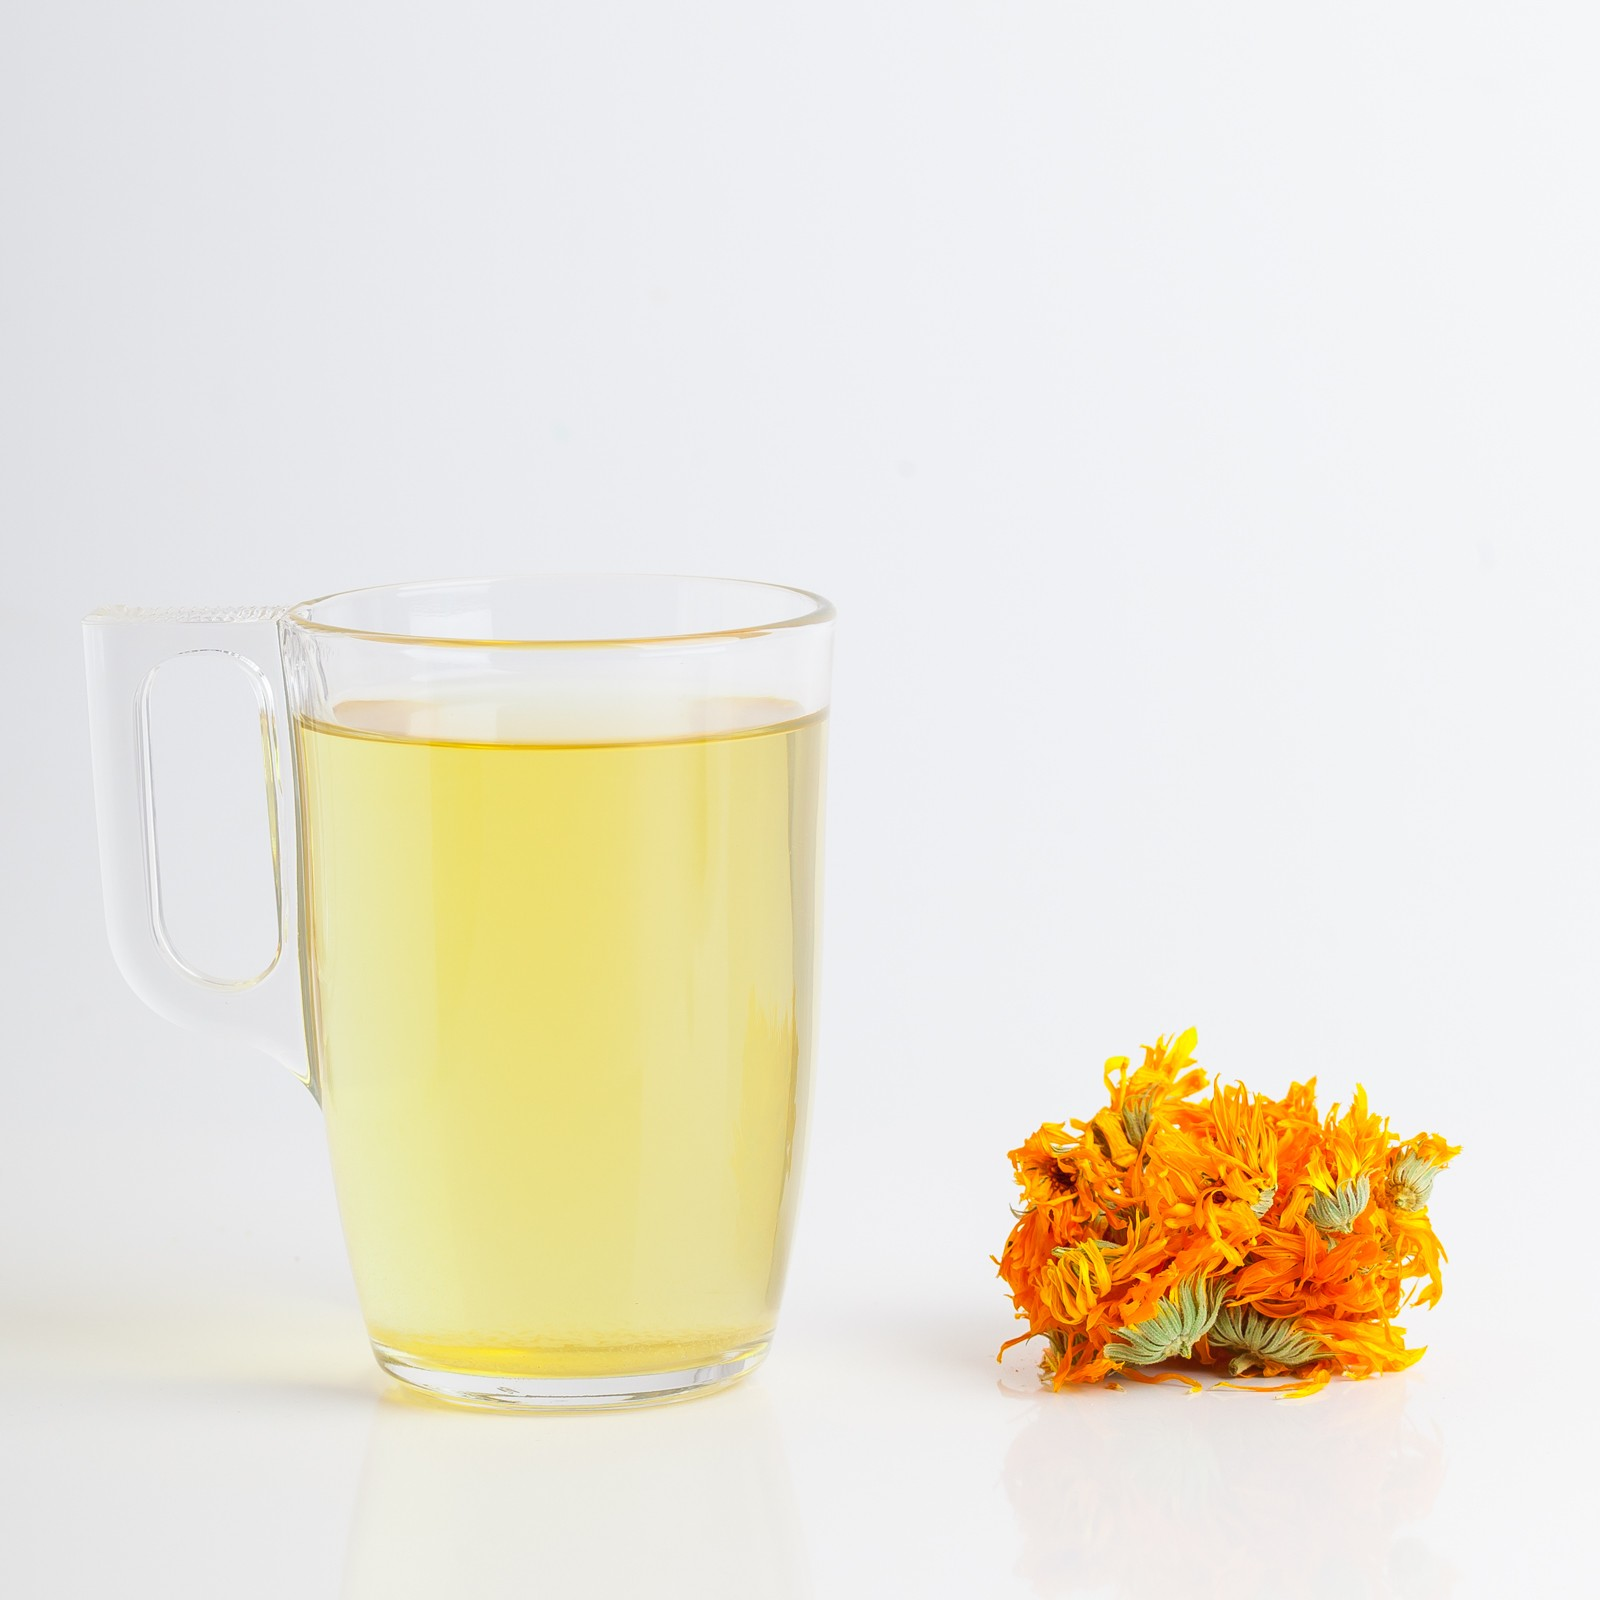 Ringelblume (Calendula) 258  plantes à tisane